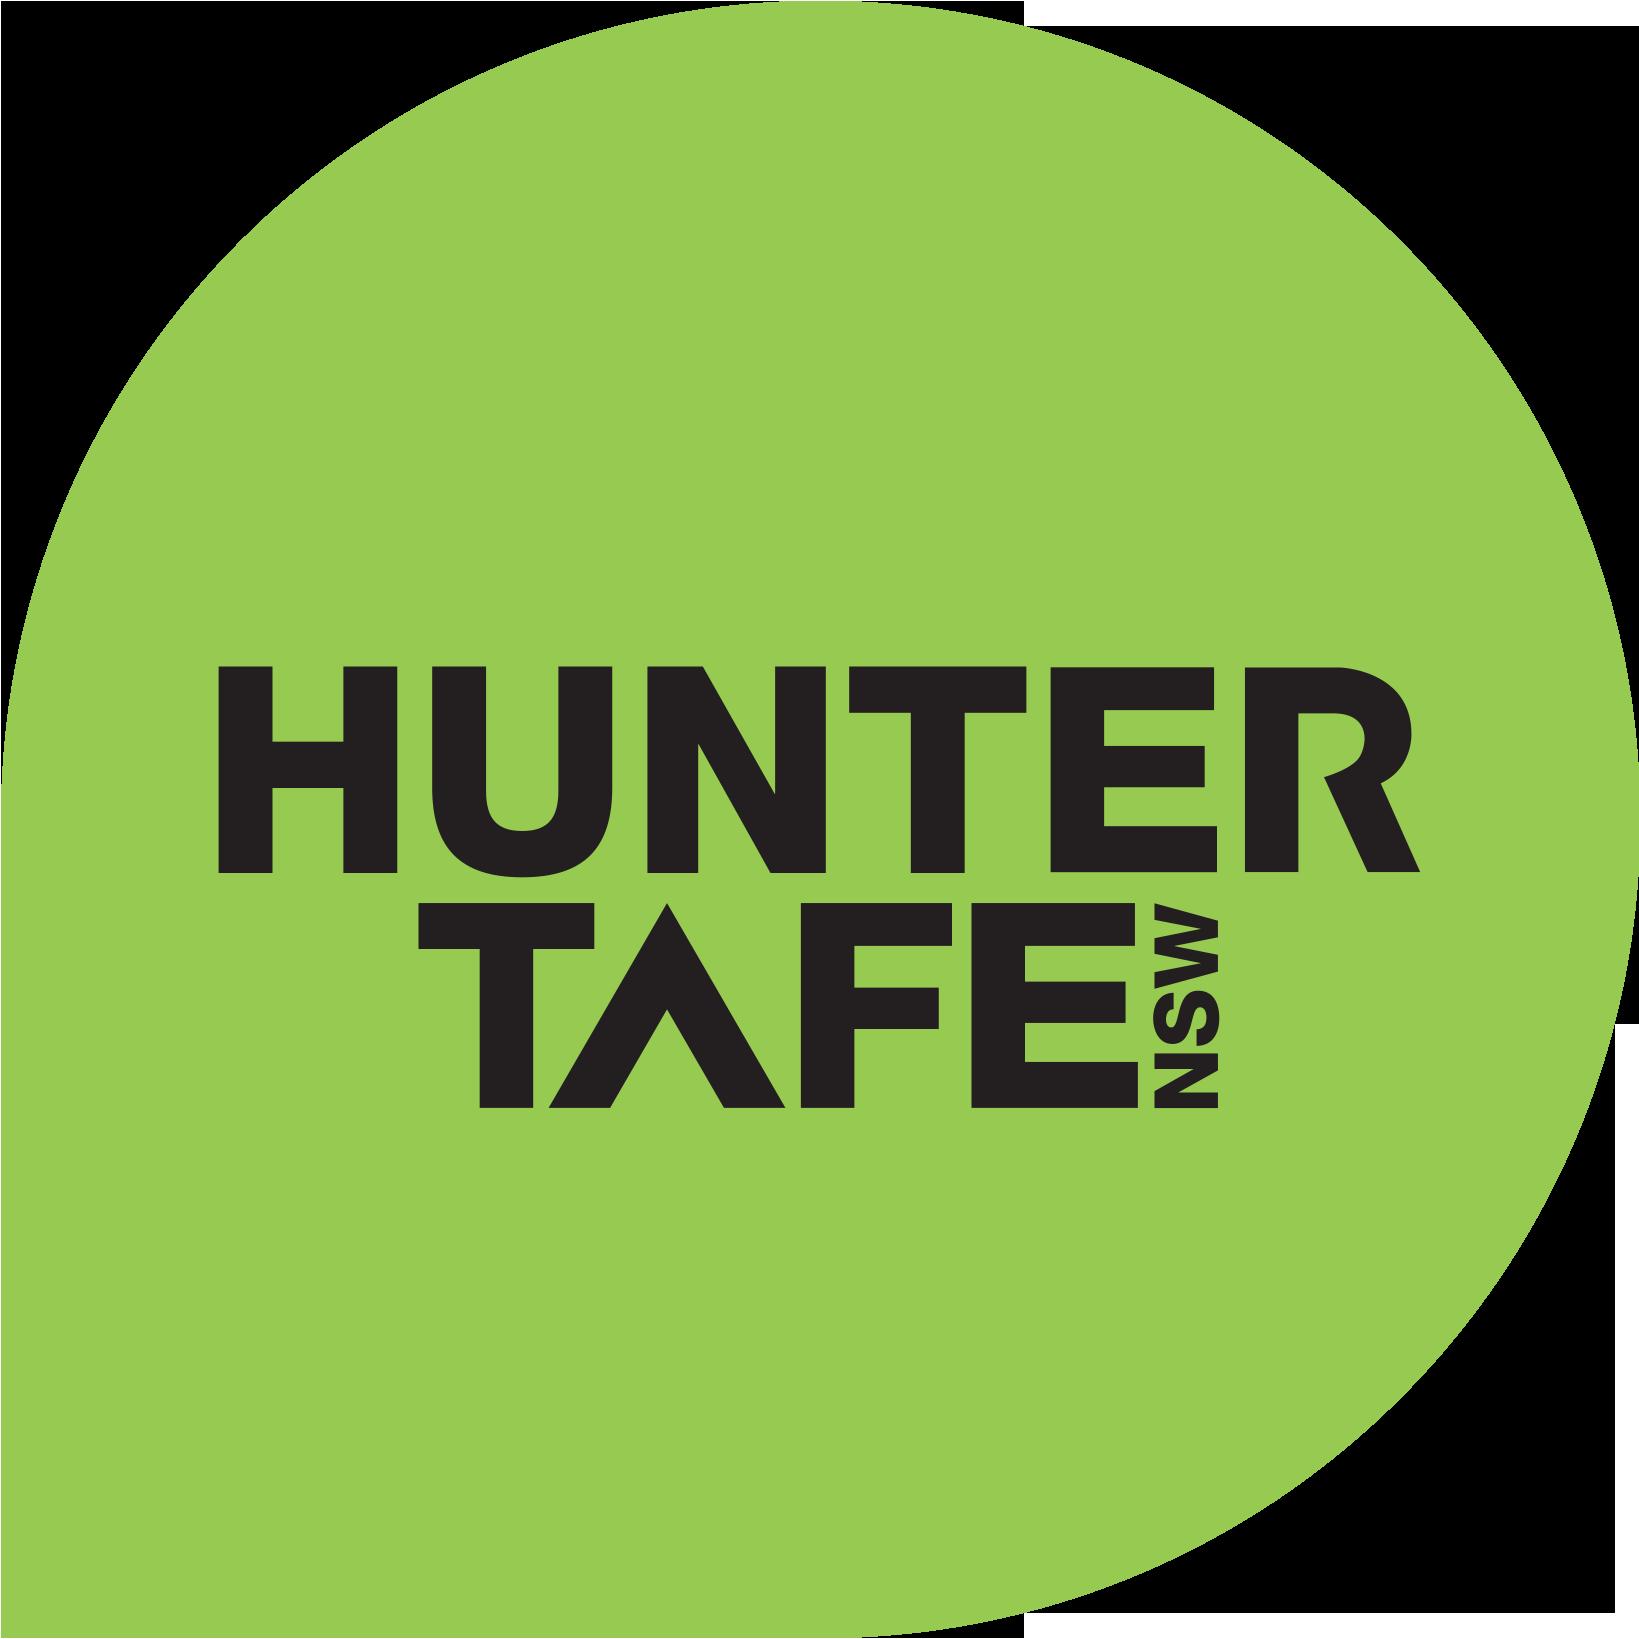 Hunter-TAFE-logo-HiRes-010914.png